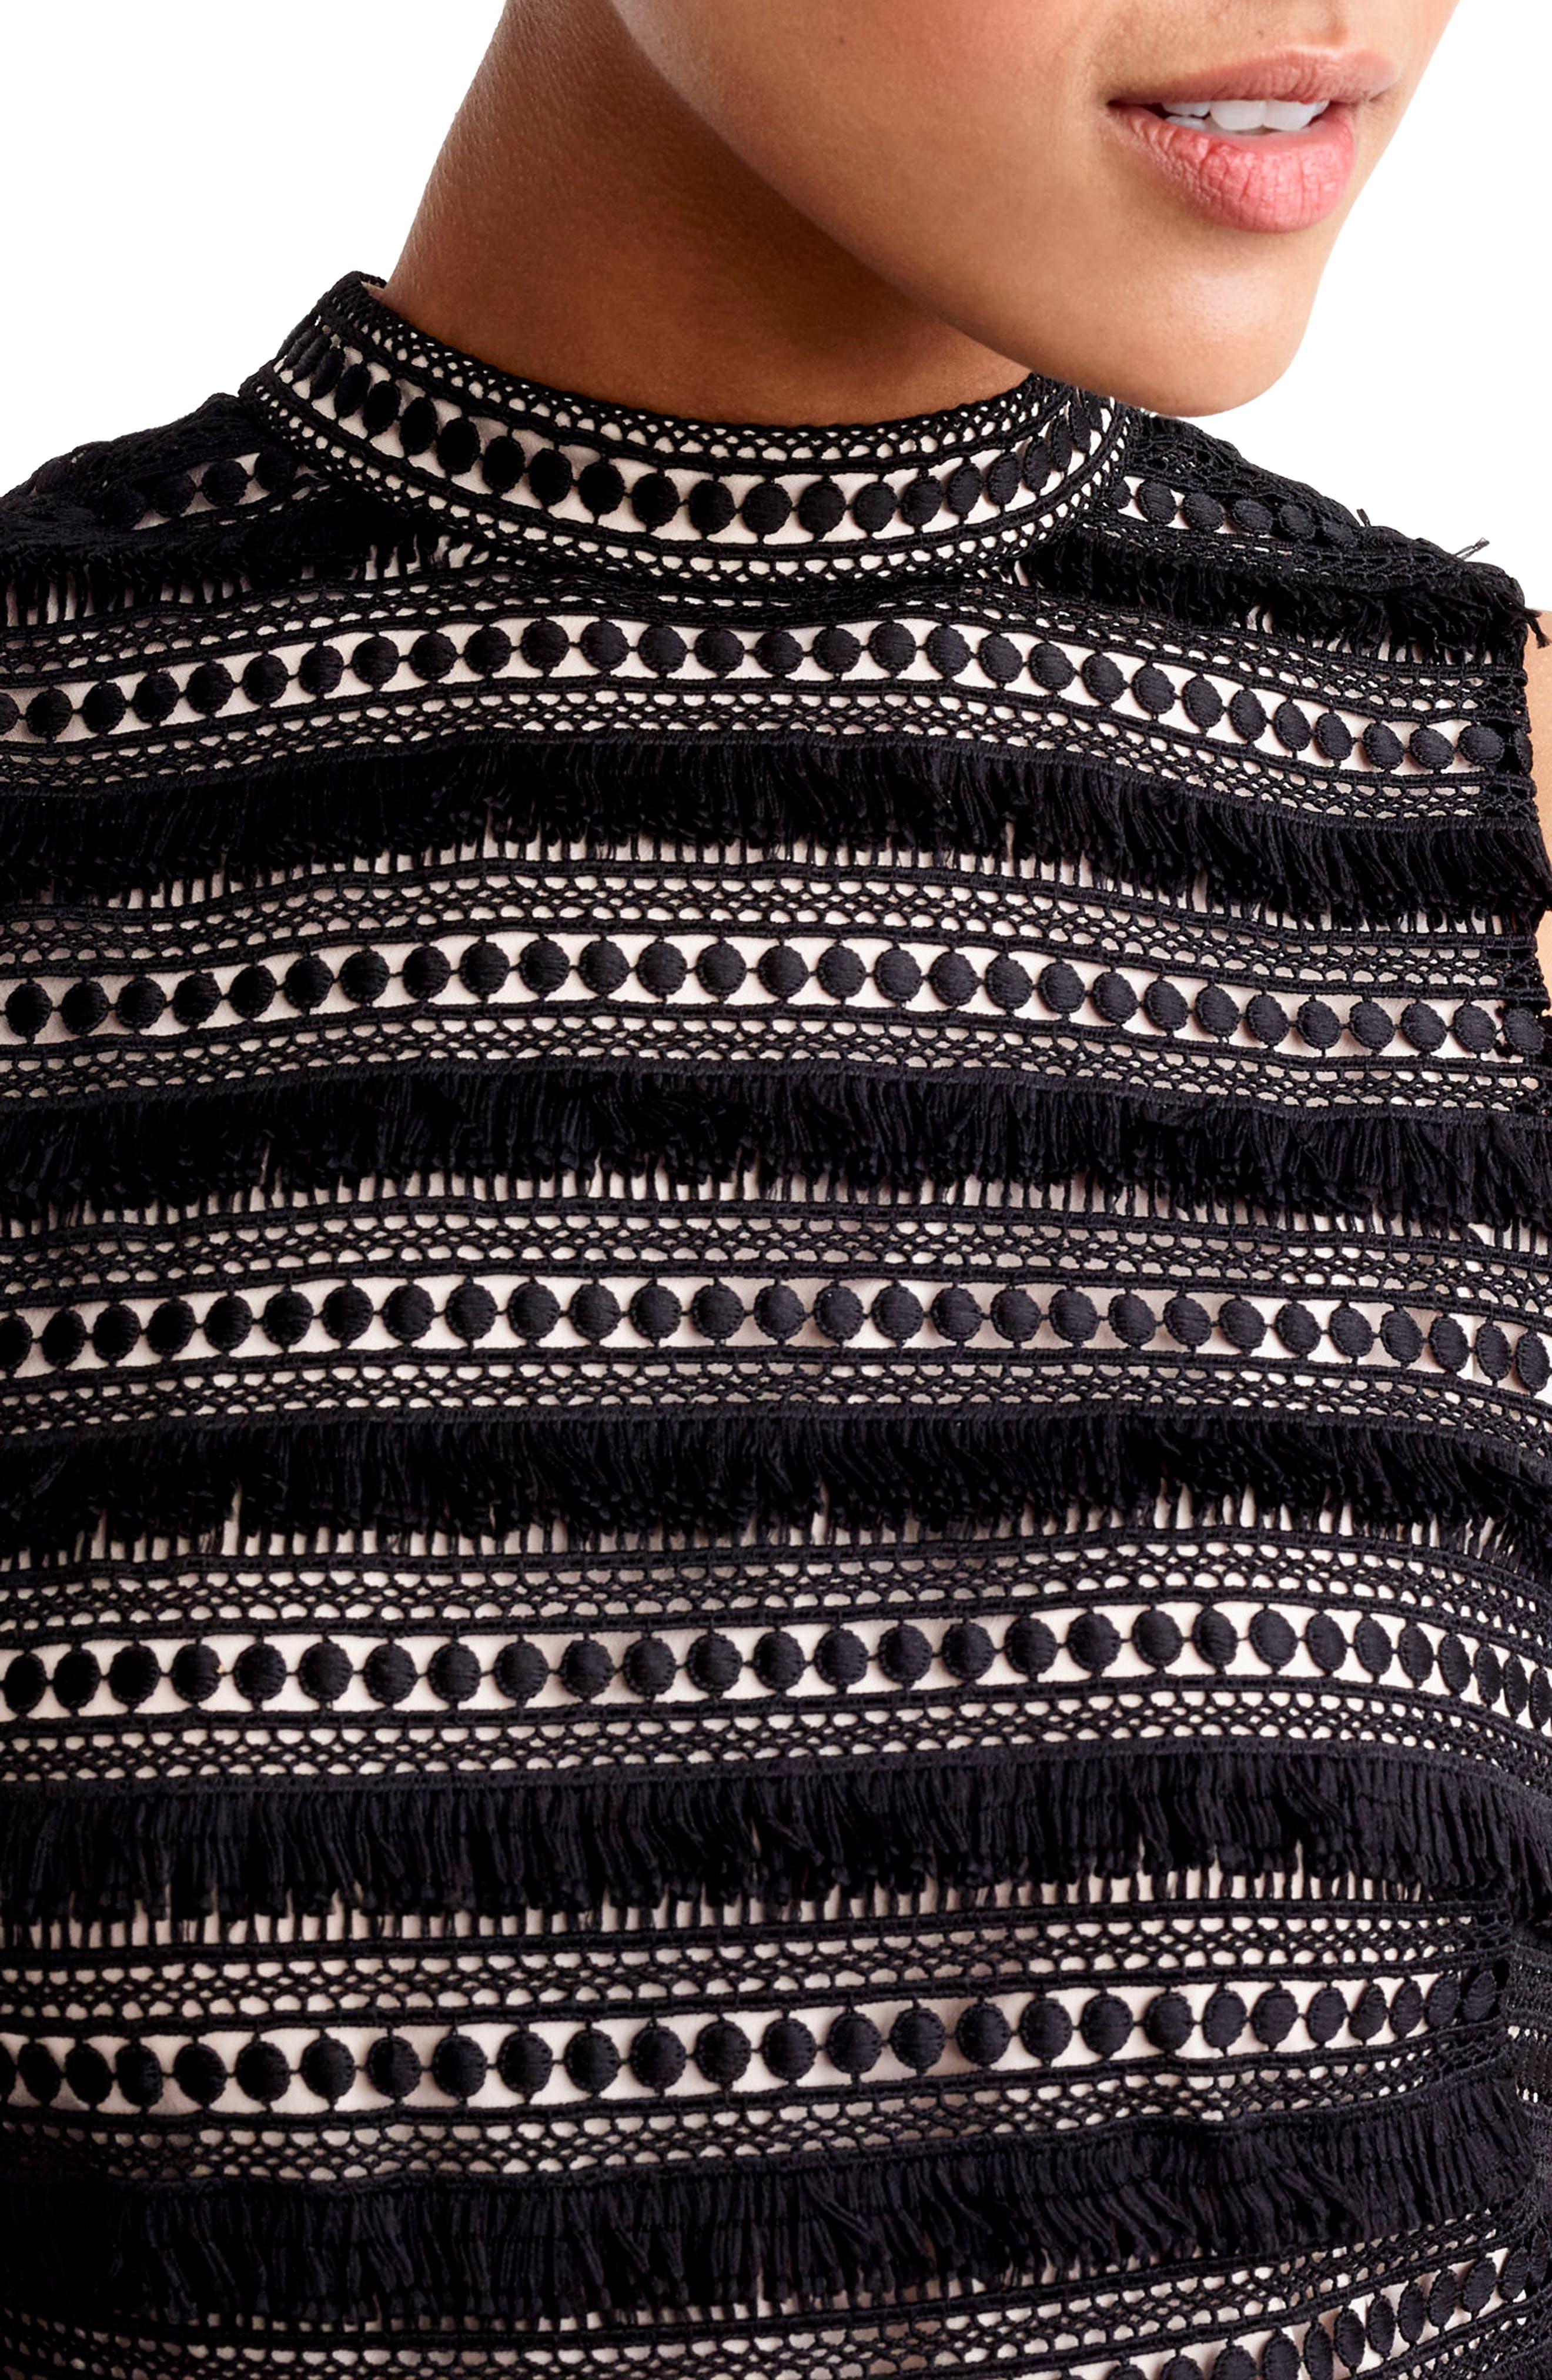 Fringy Lace Sheath Dress,                             Alternate thumbnail 3, color,                             001